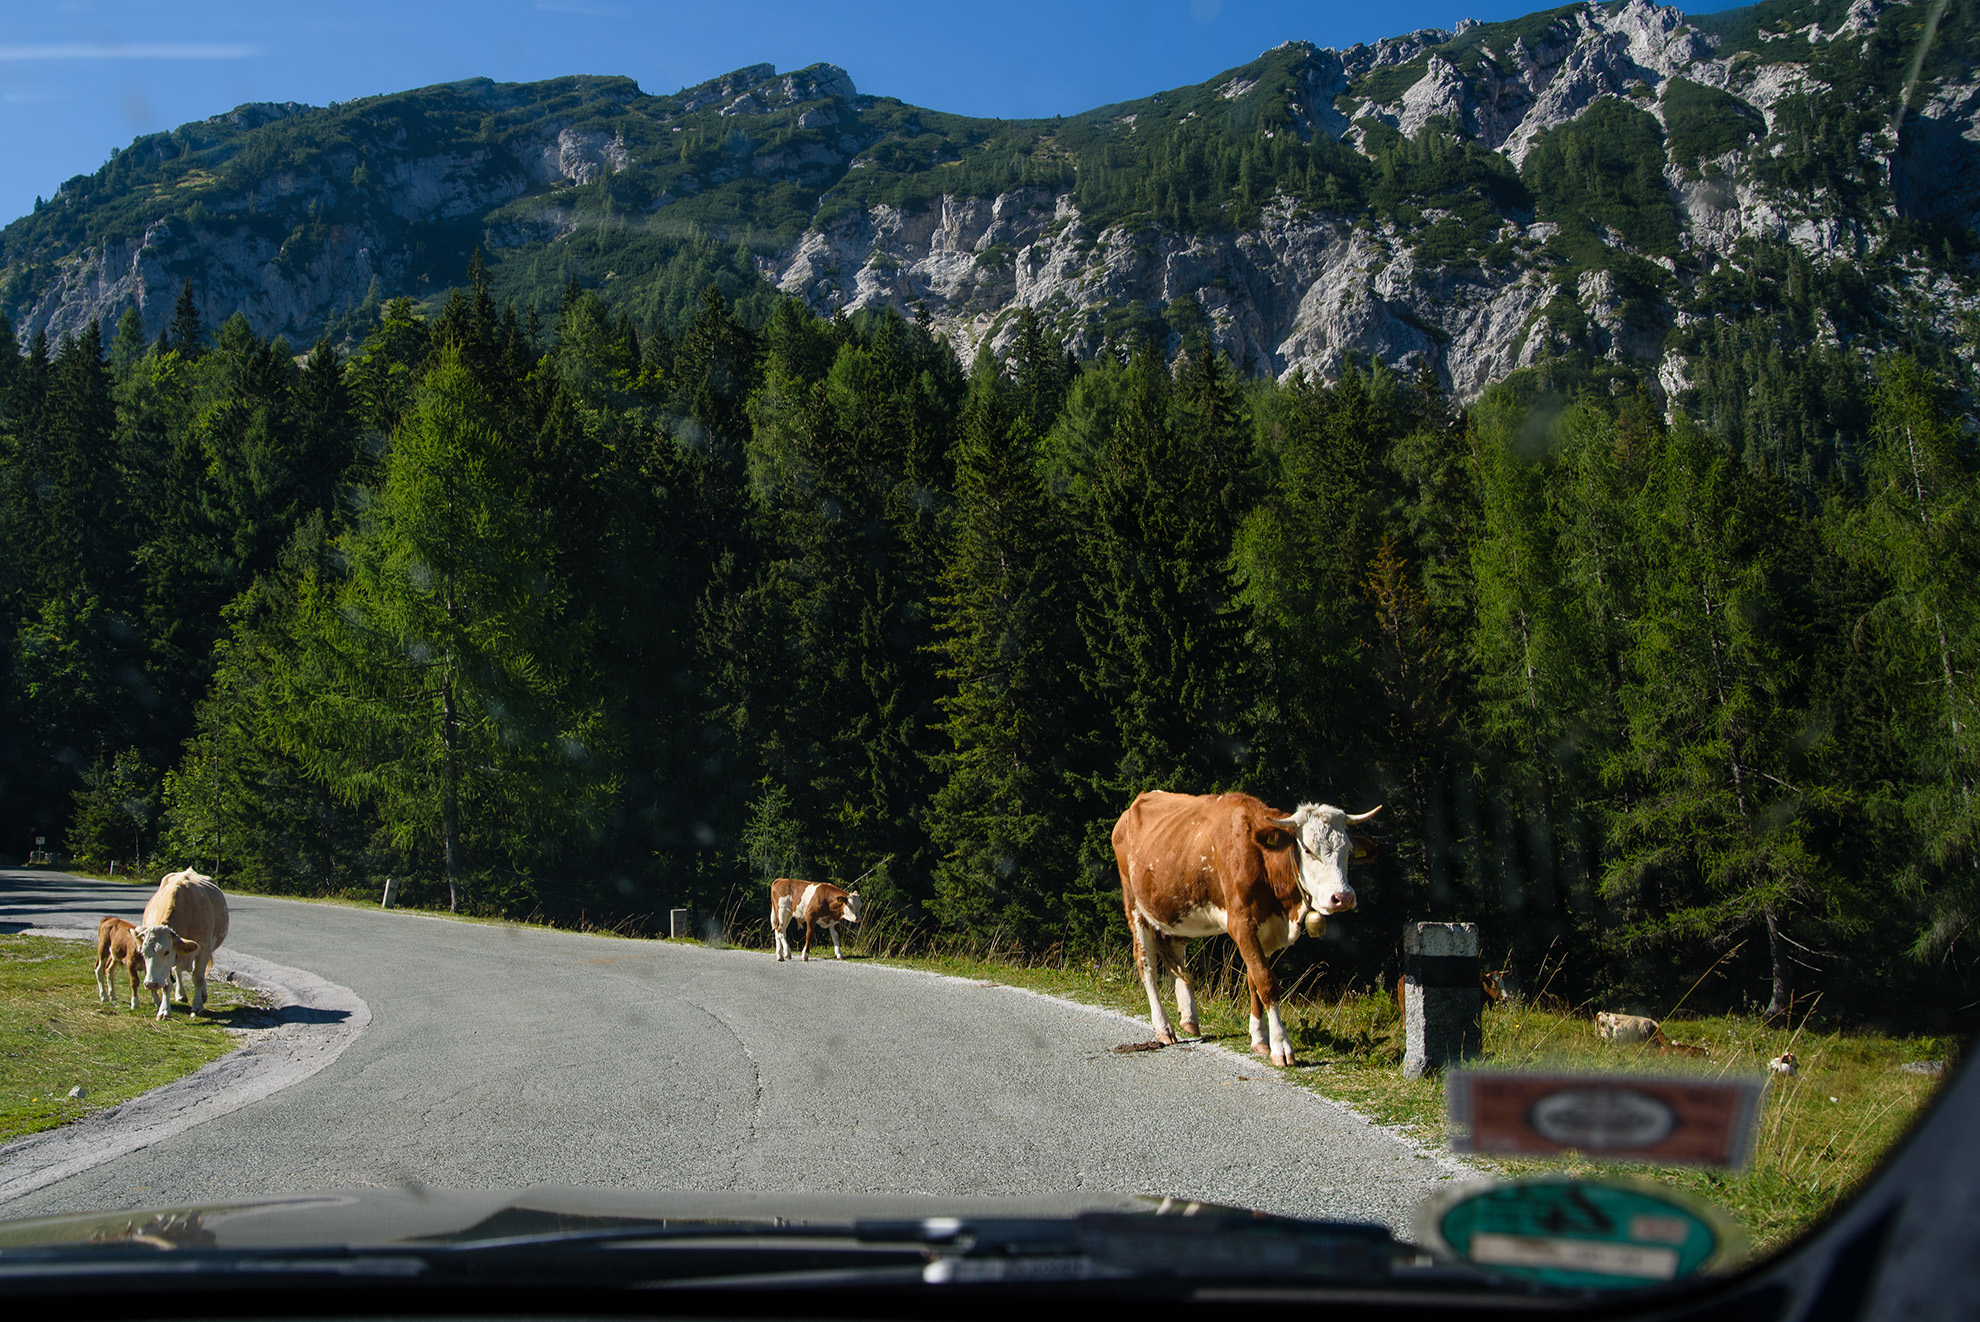 Górskie drogi i górskie krówki